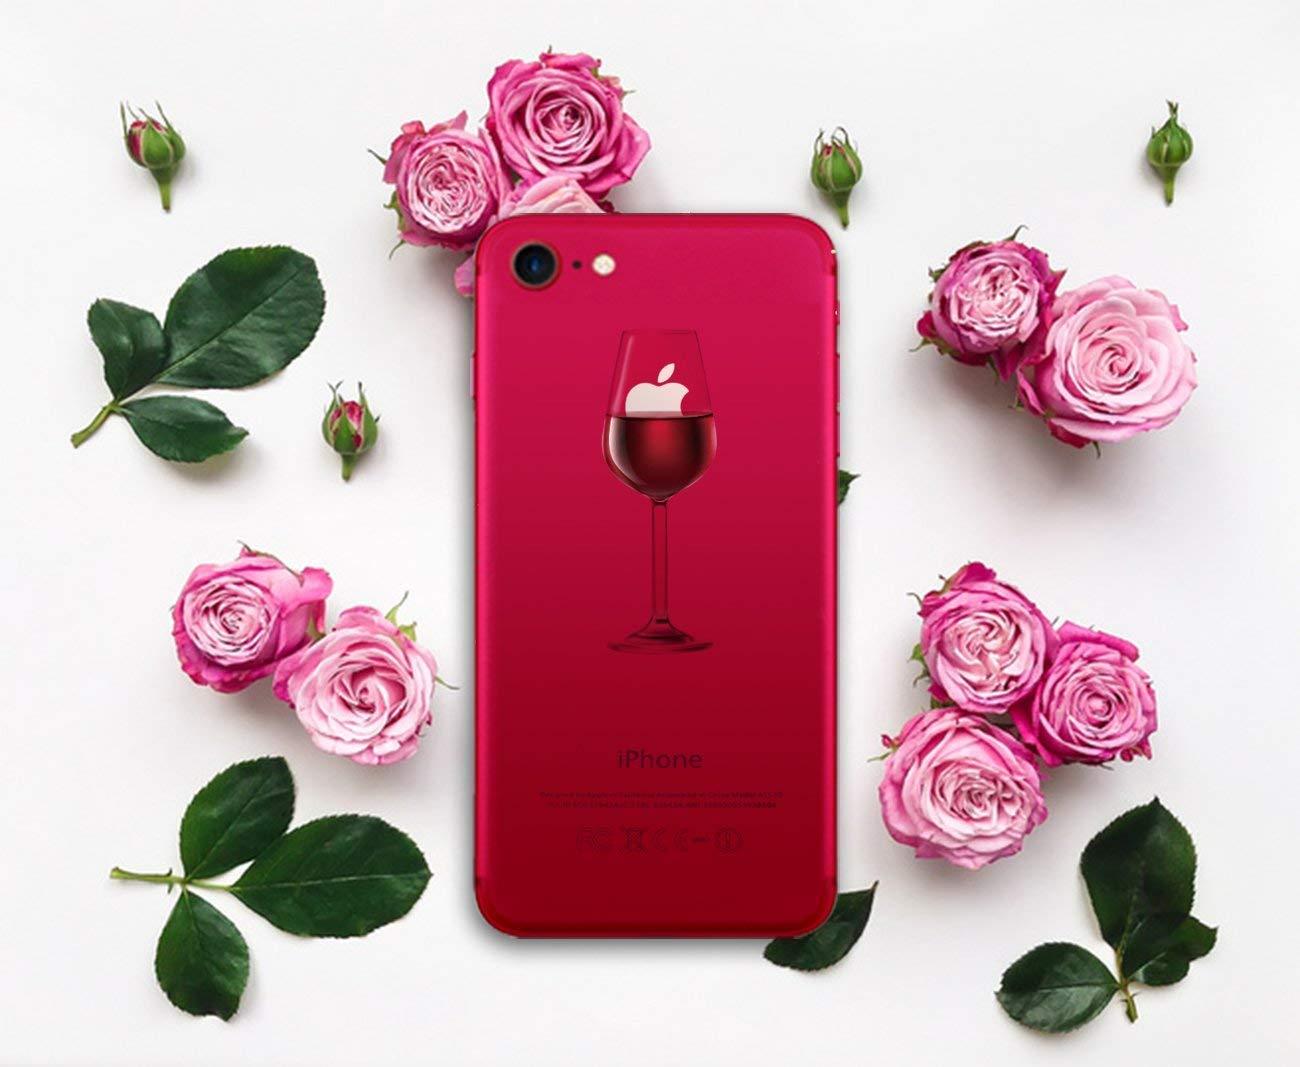 Caler iPhone 7 Trasparente Ultra Slim Custodia iPhone 8